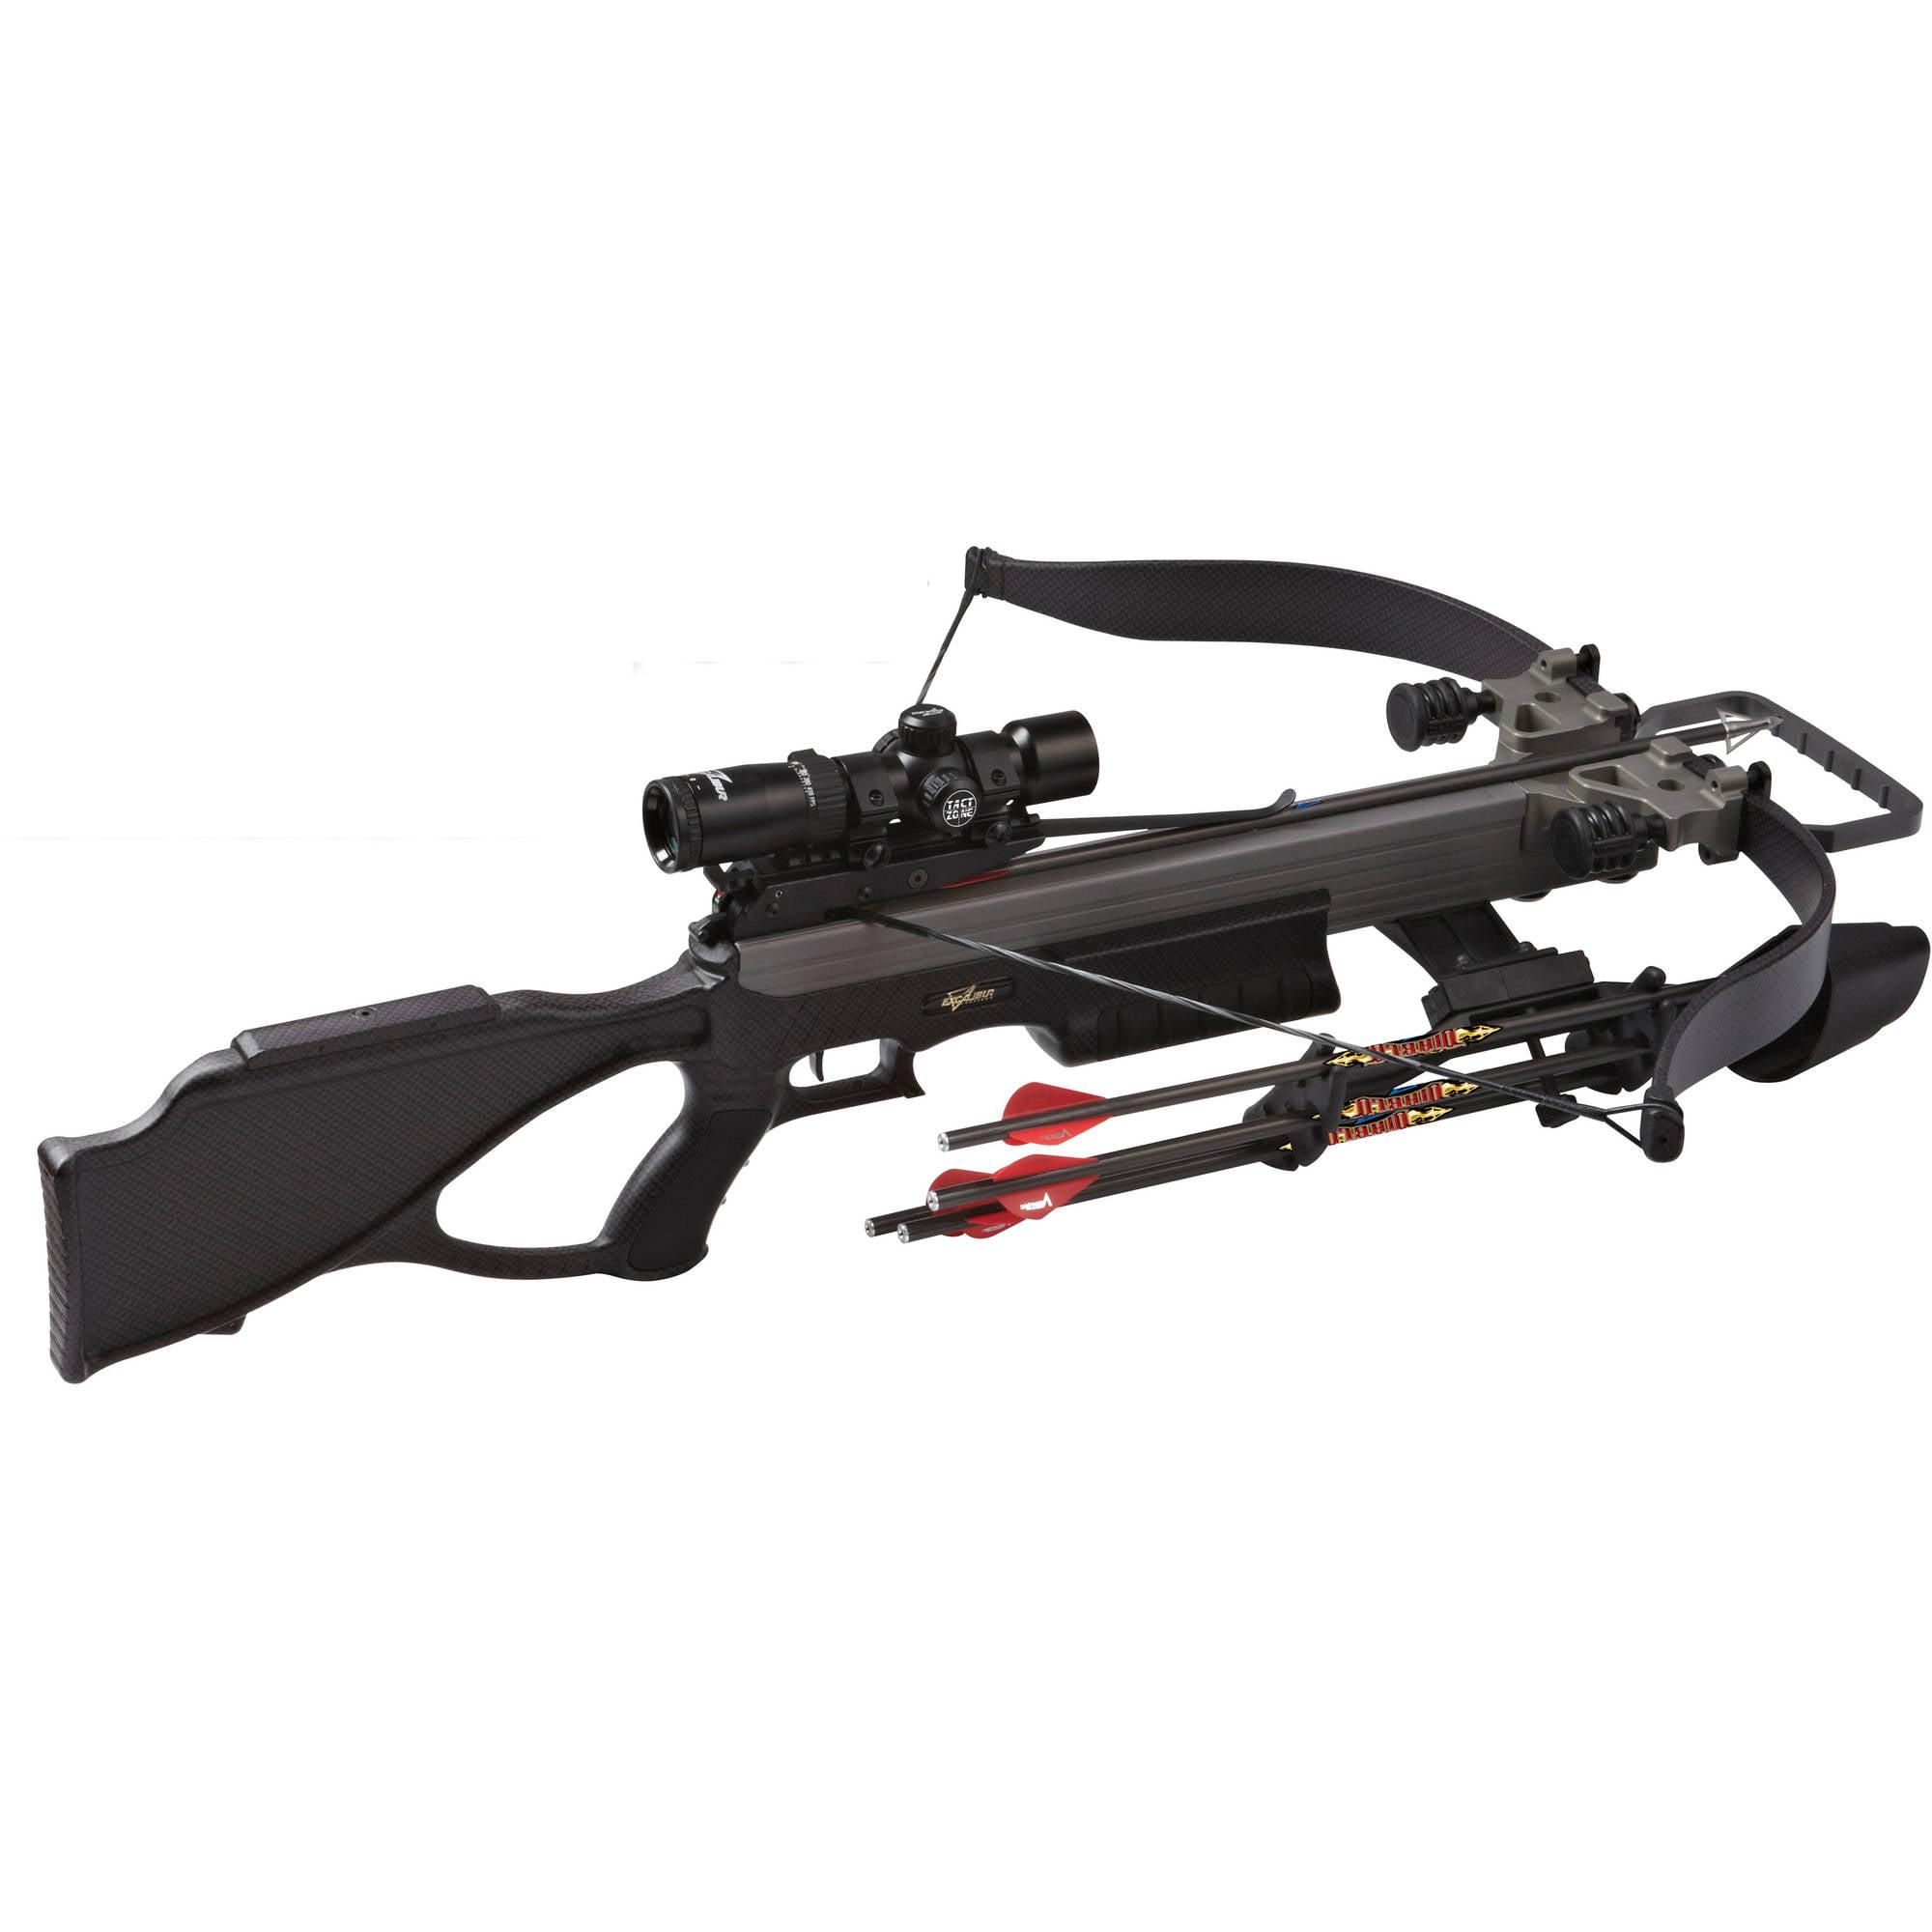 Excalibur Matrix 380 260 lb Crossbow Package